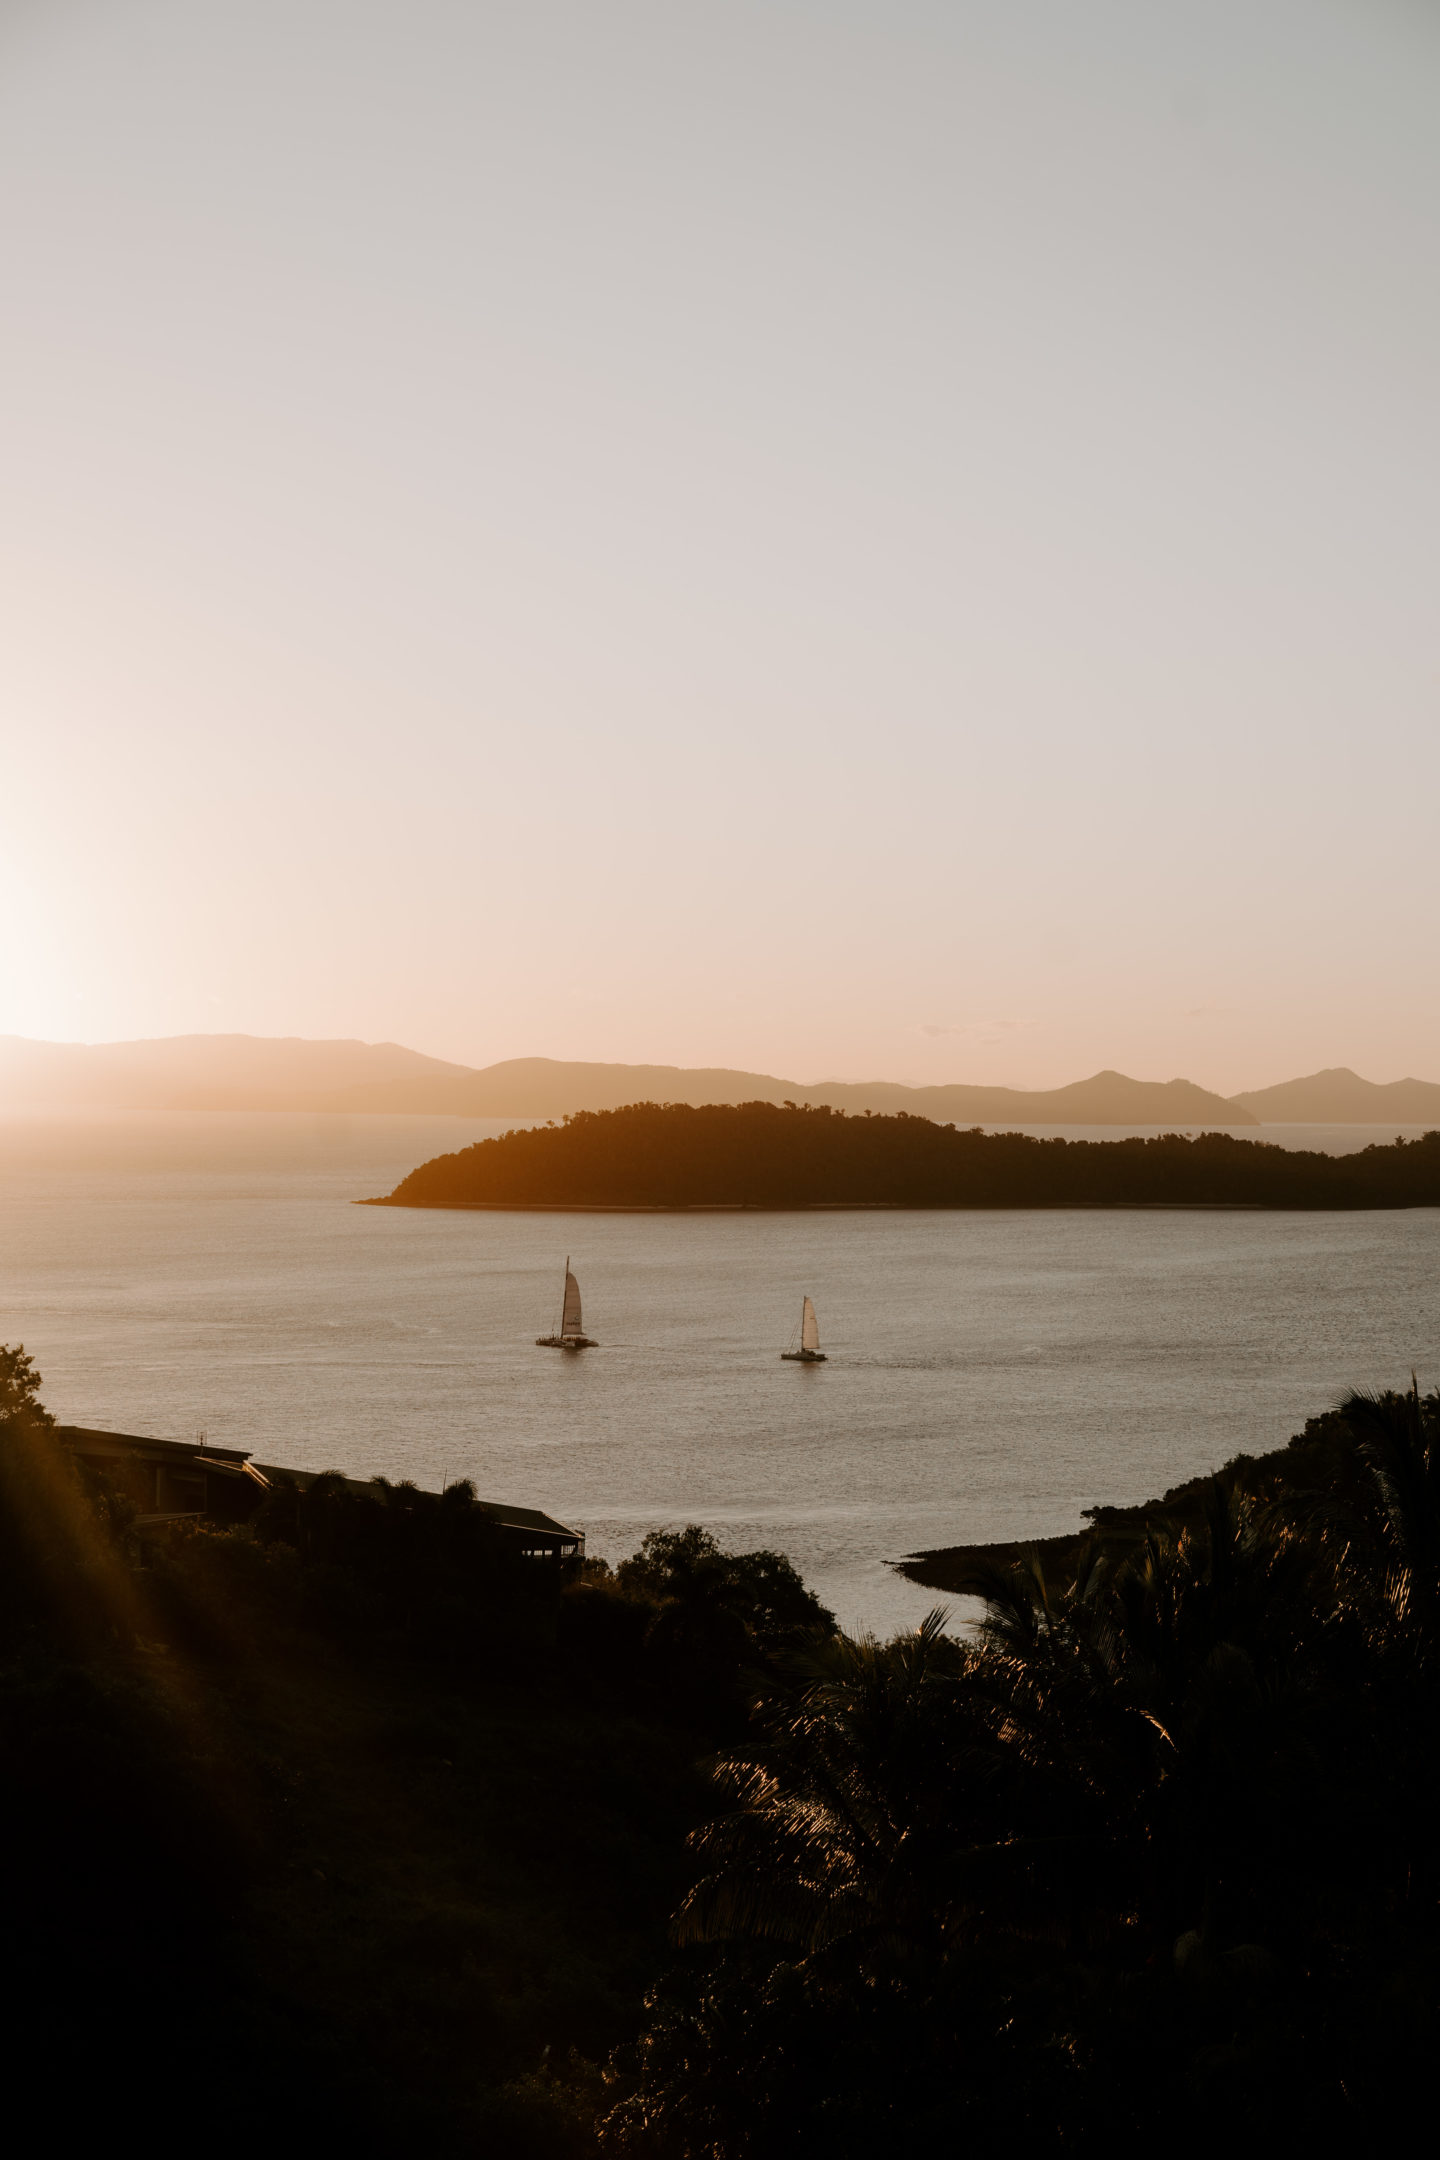 qualia resort review | WORLD OF WANDERLUST